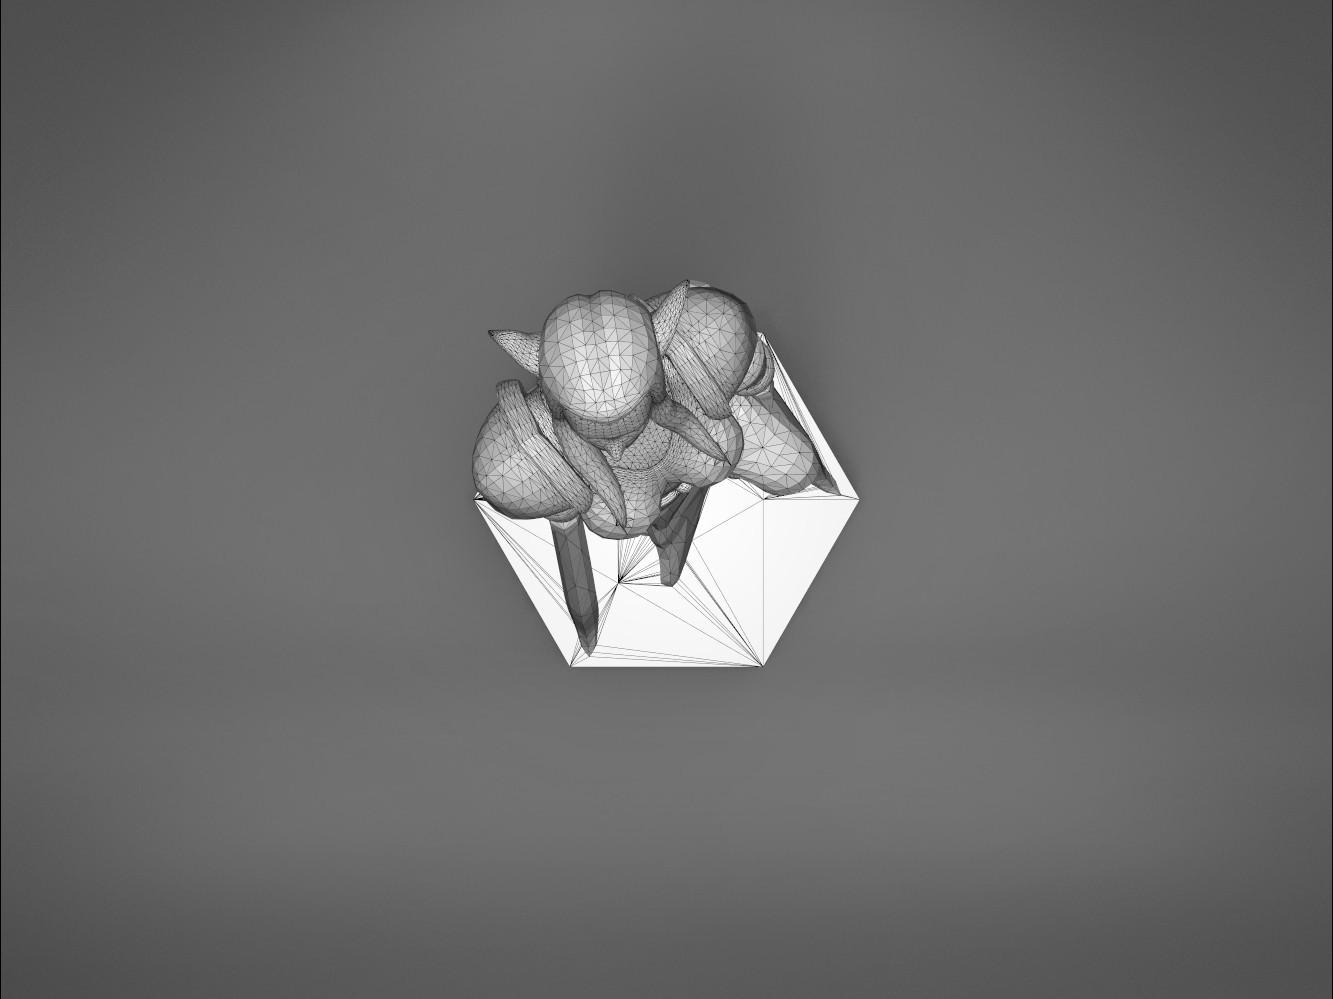 Warrior_2-top_perspective.329.jpg Download STL file ELF WARRIOR FEMALE CHARACTER GAME FIGURE 3D print model • 3D printing object, 3D-mon